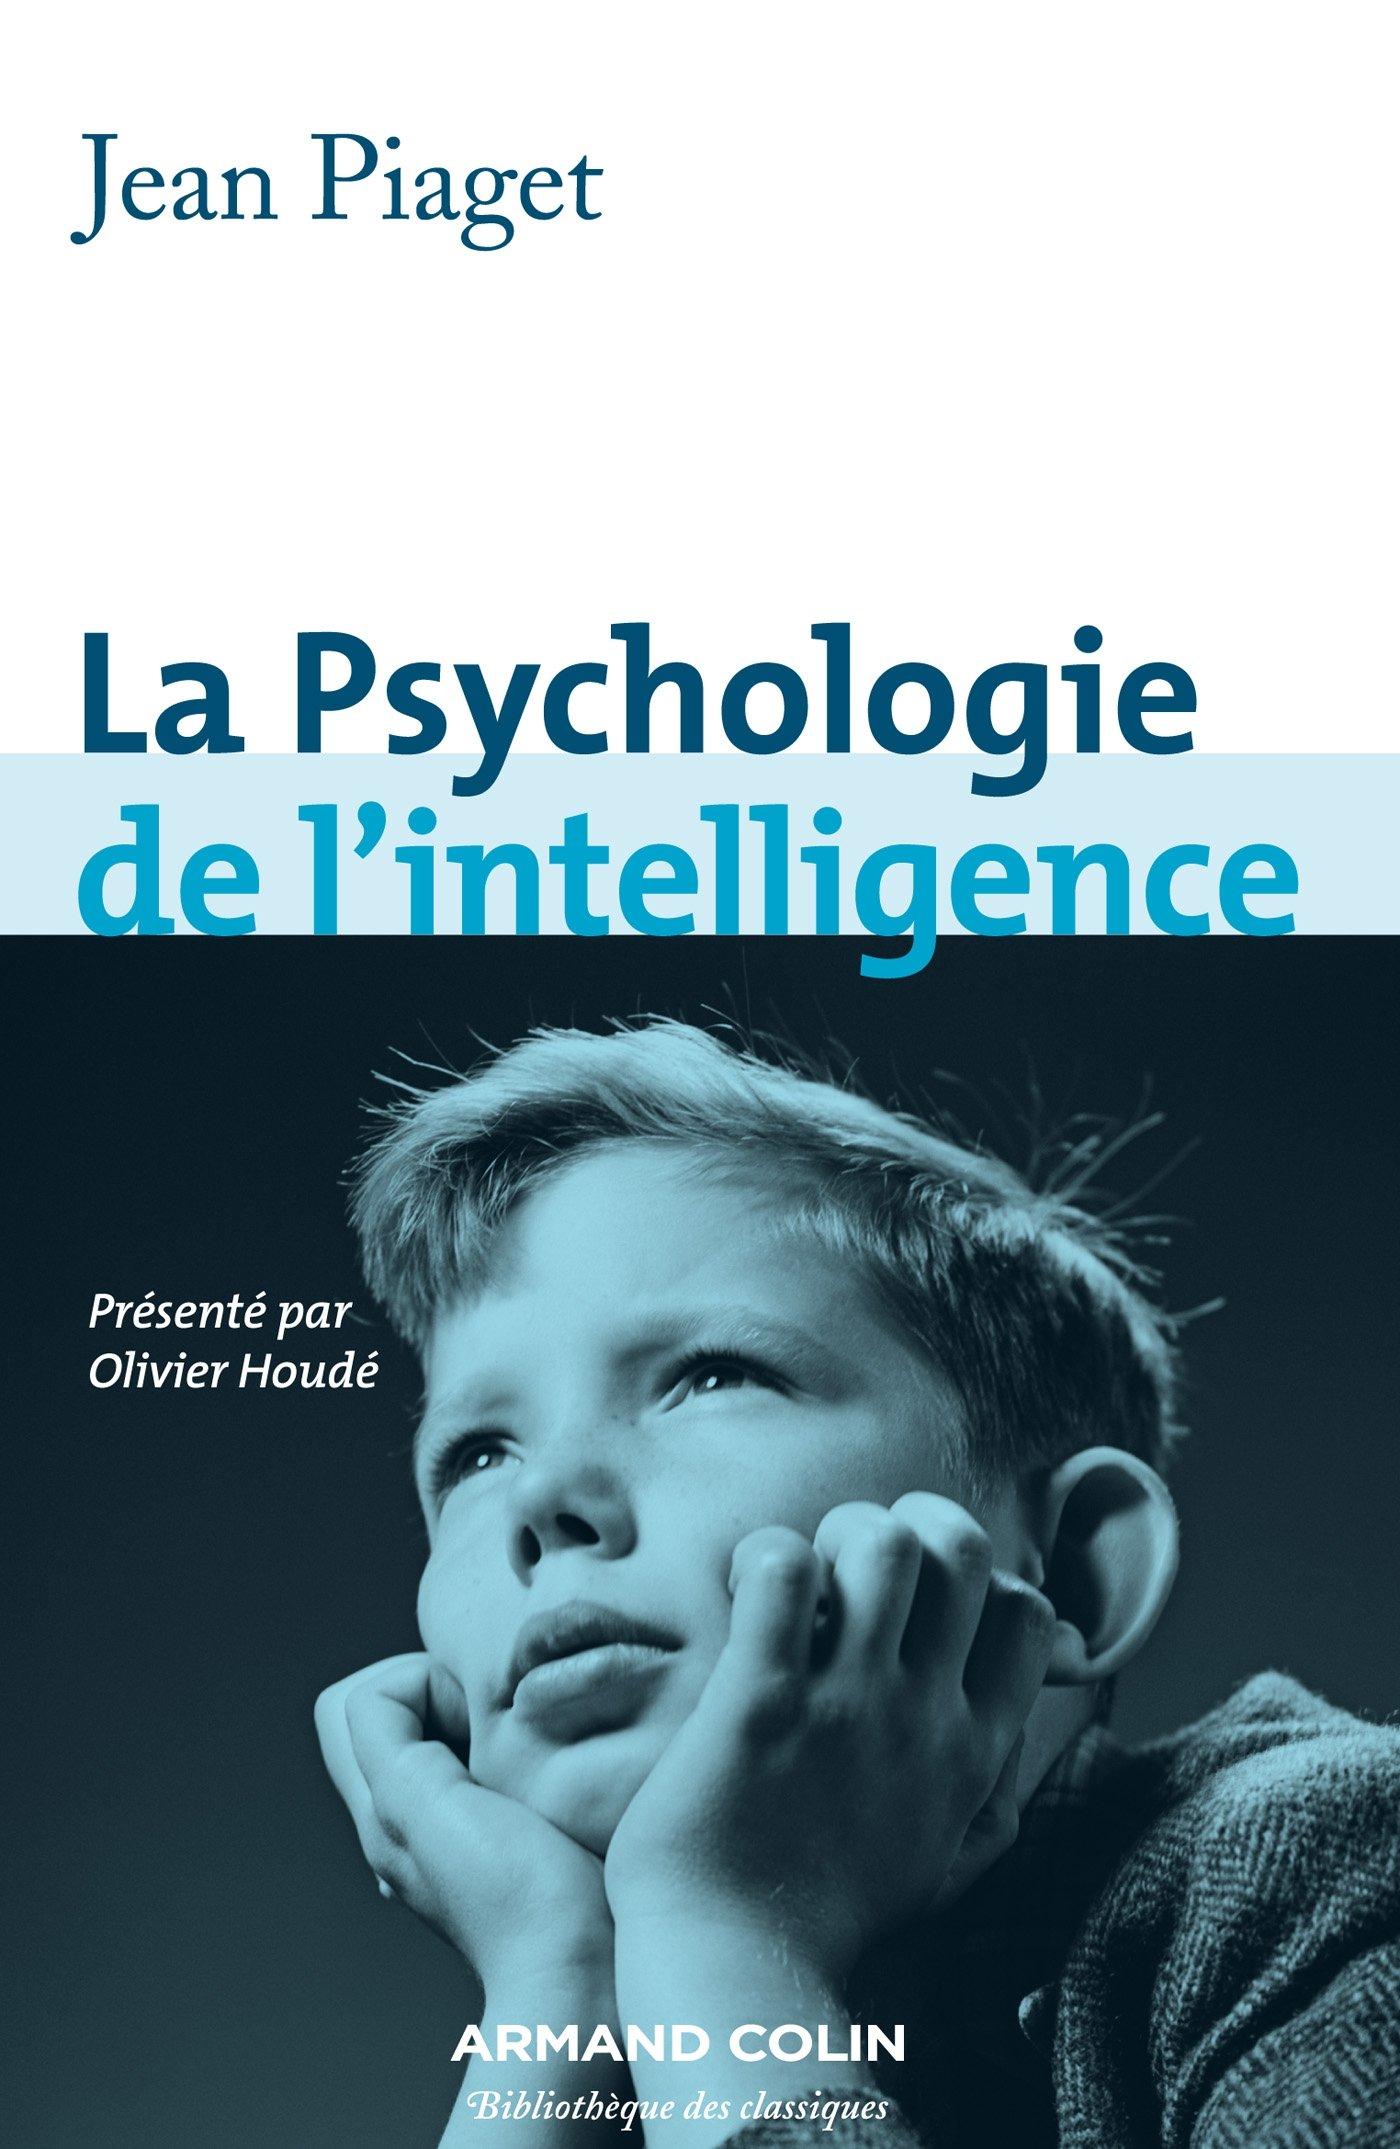 La psychologie de l'intelligence - Jean Piaget